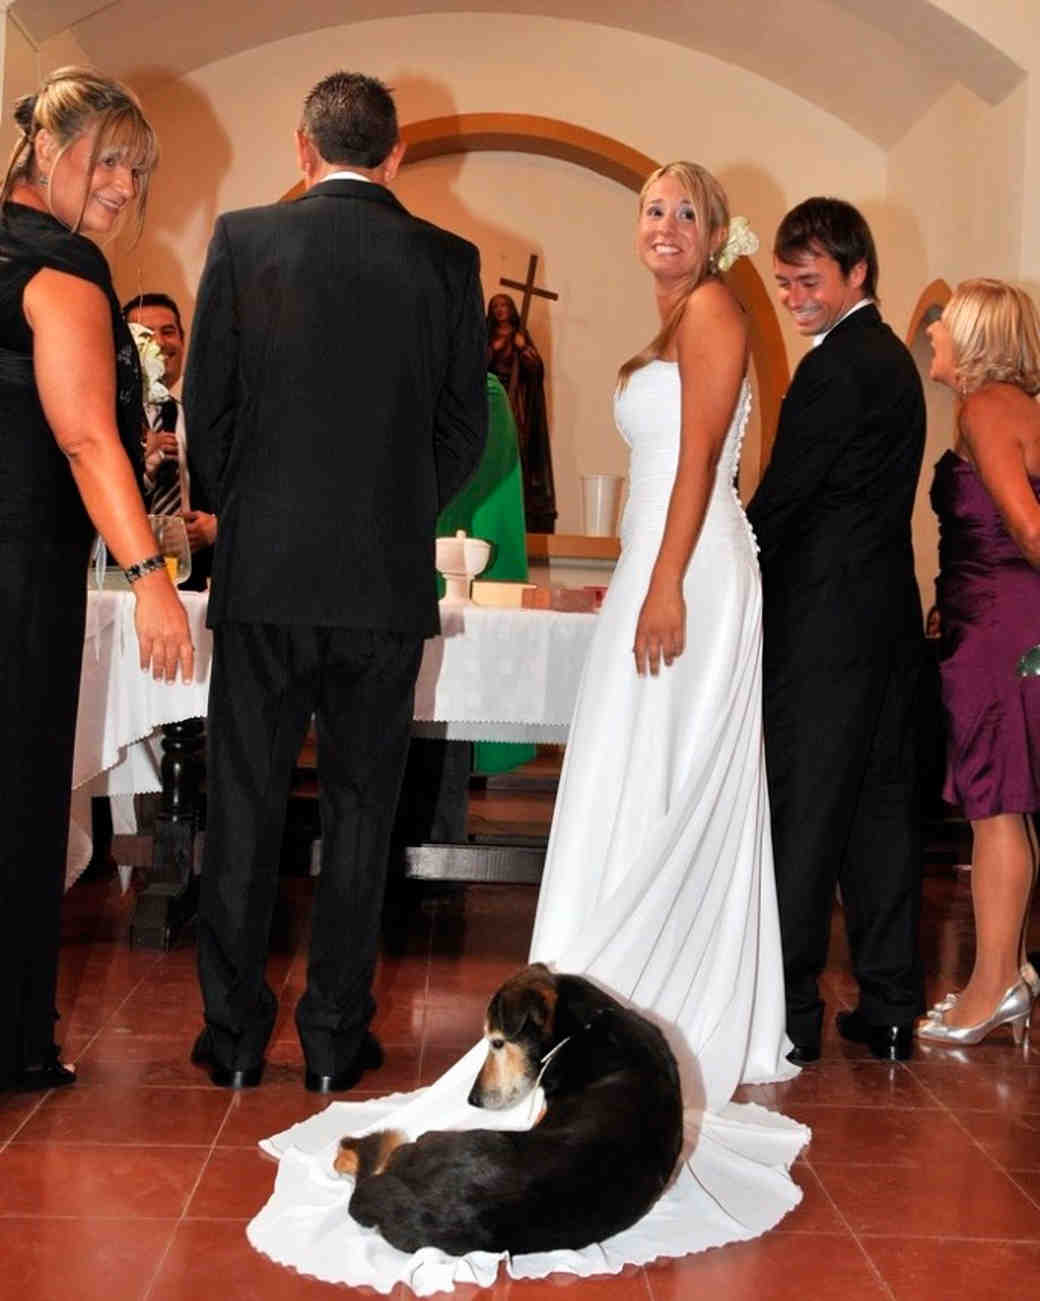 hilarious-wedding-photos-dog-on-dress-1115.jpg